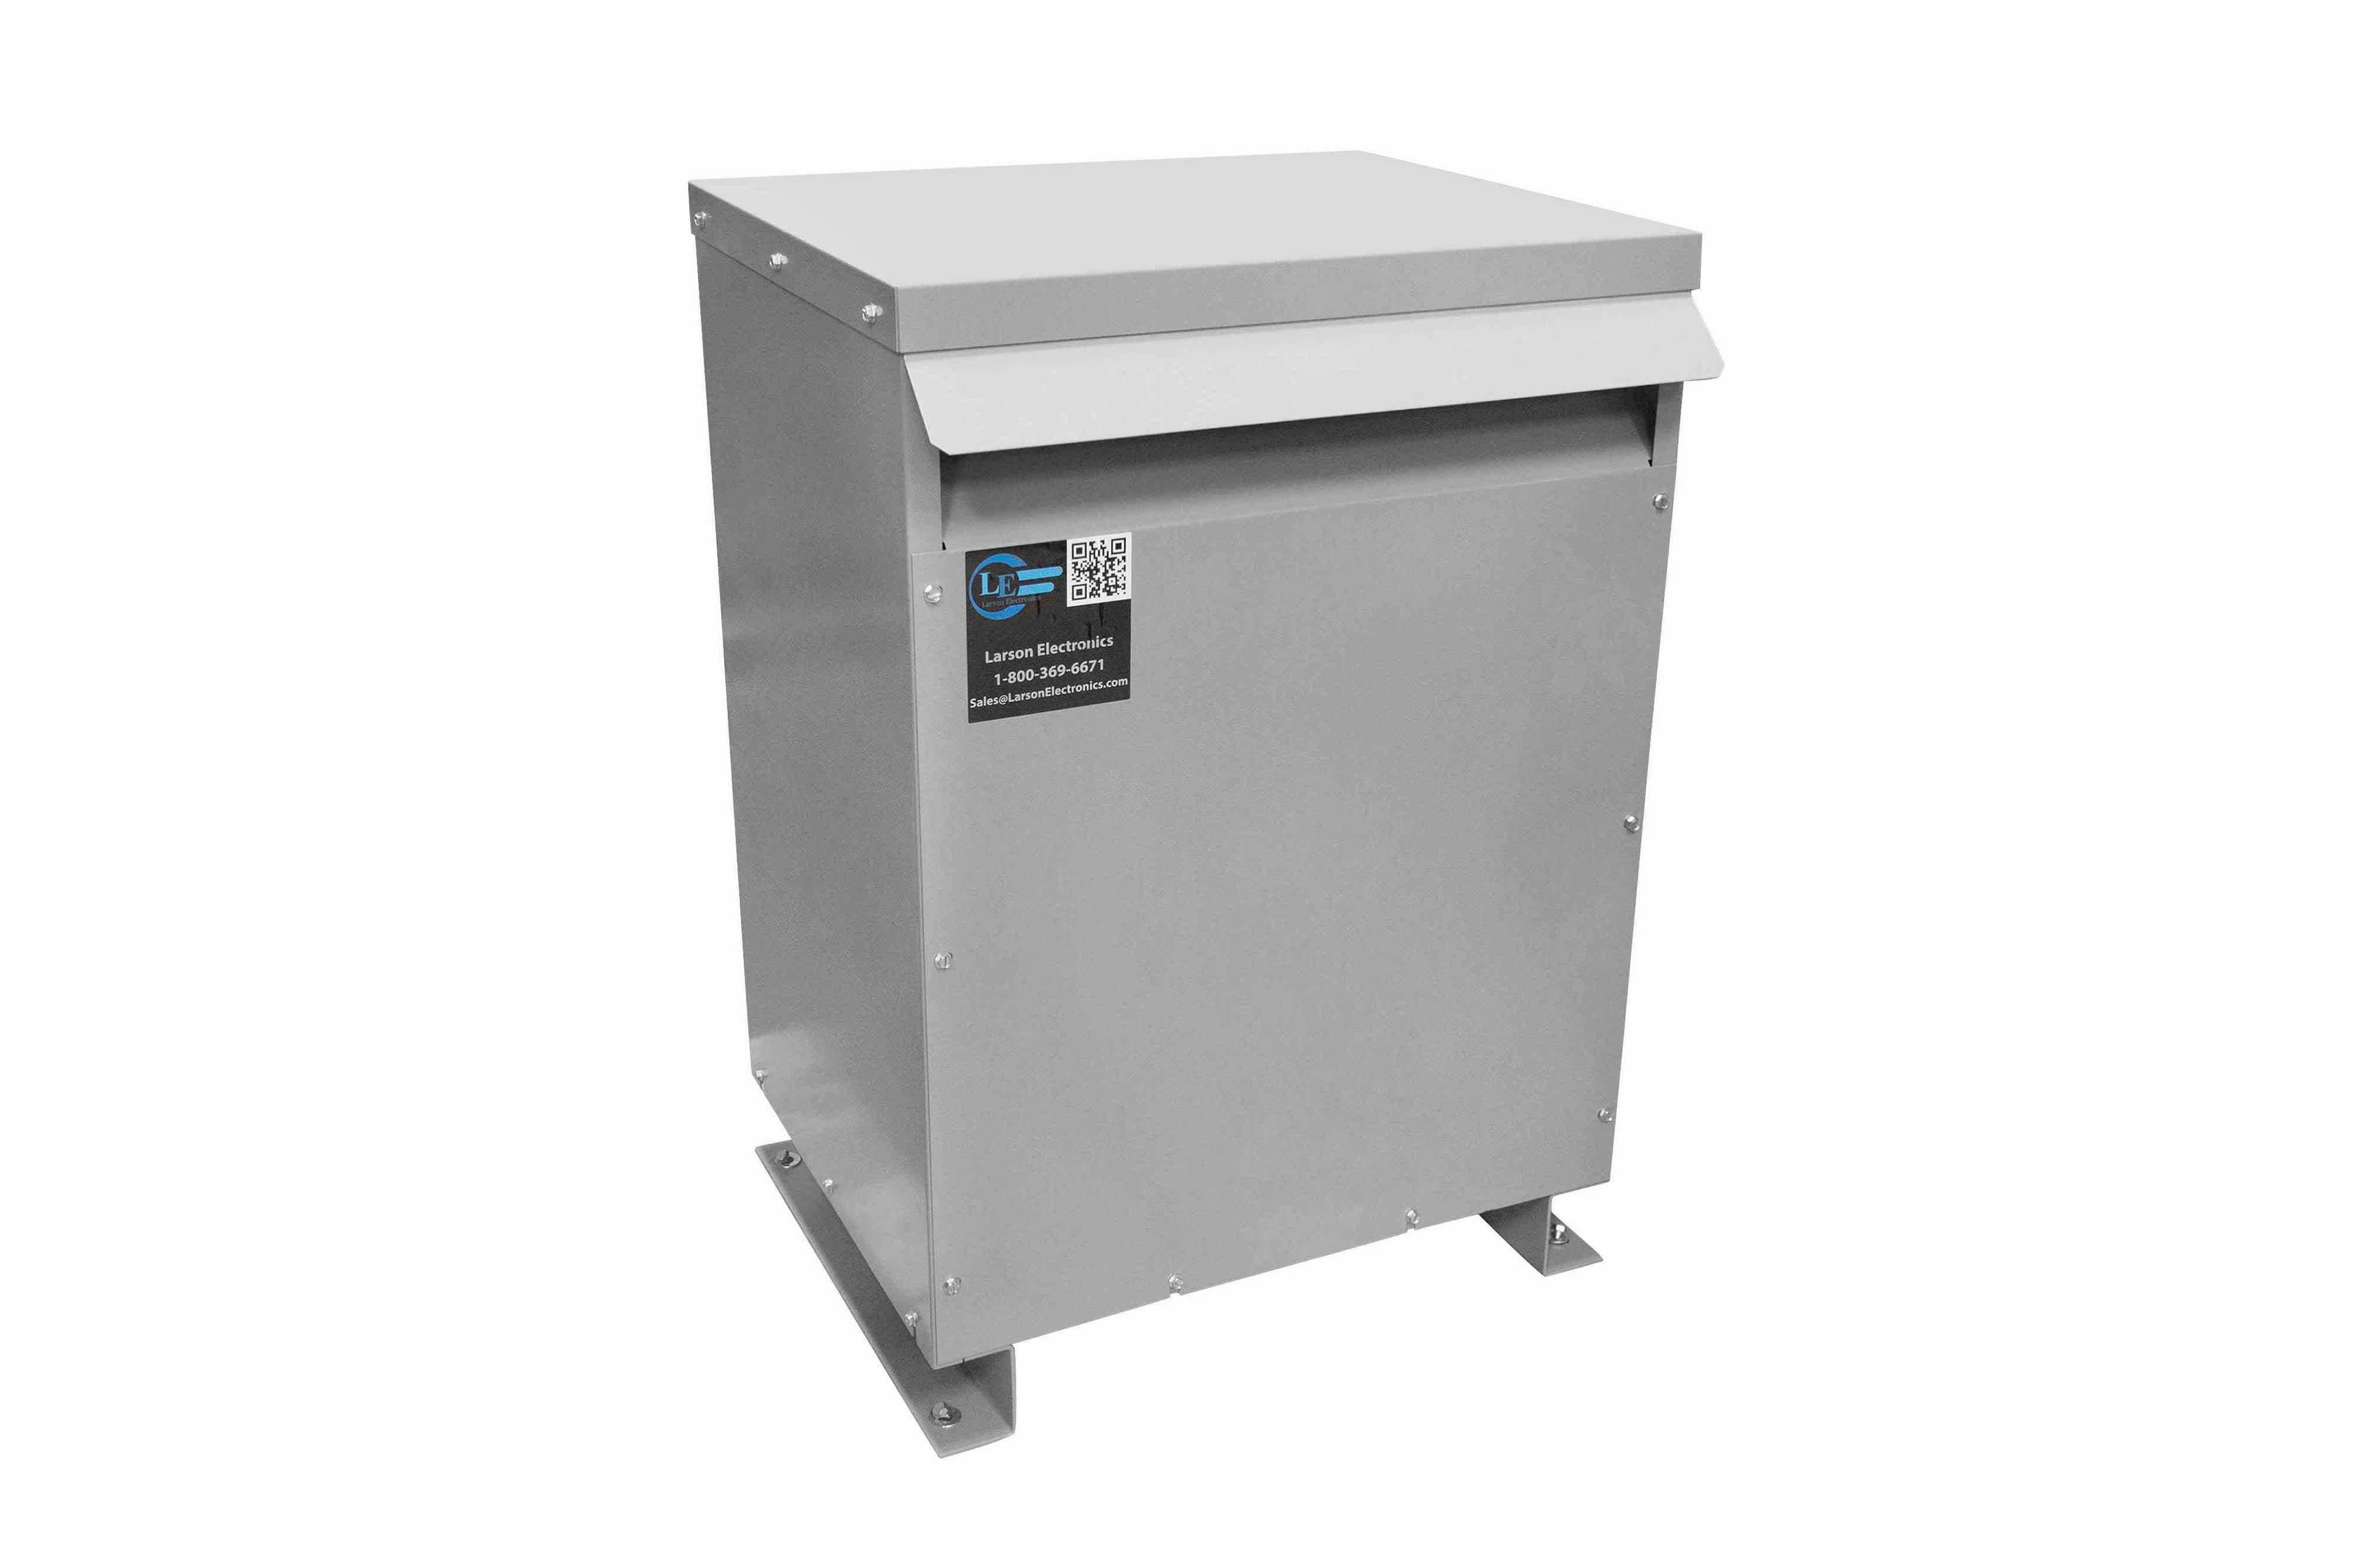 22.5 kVA 3PH Isolation Transformer, 460V Wye Primary, 575Y/332 Wye-N Secondary, N3R, Ventilated, 60 Hz